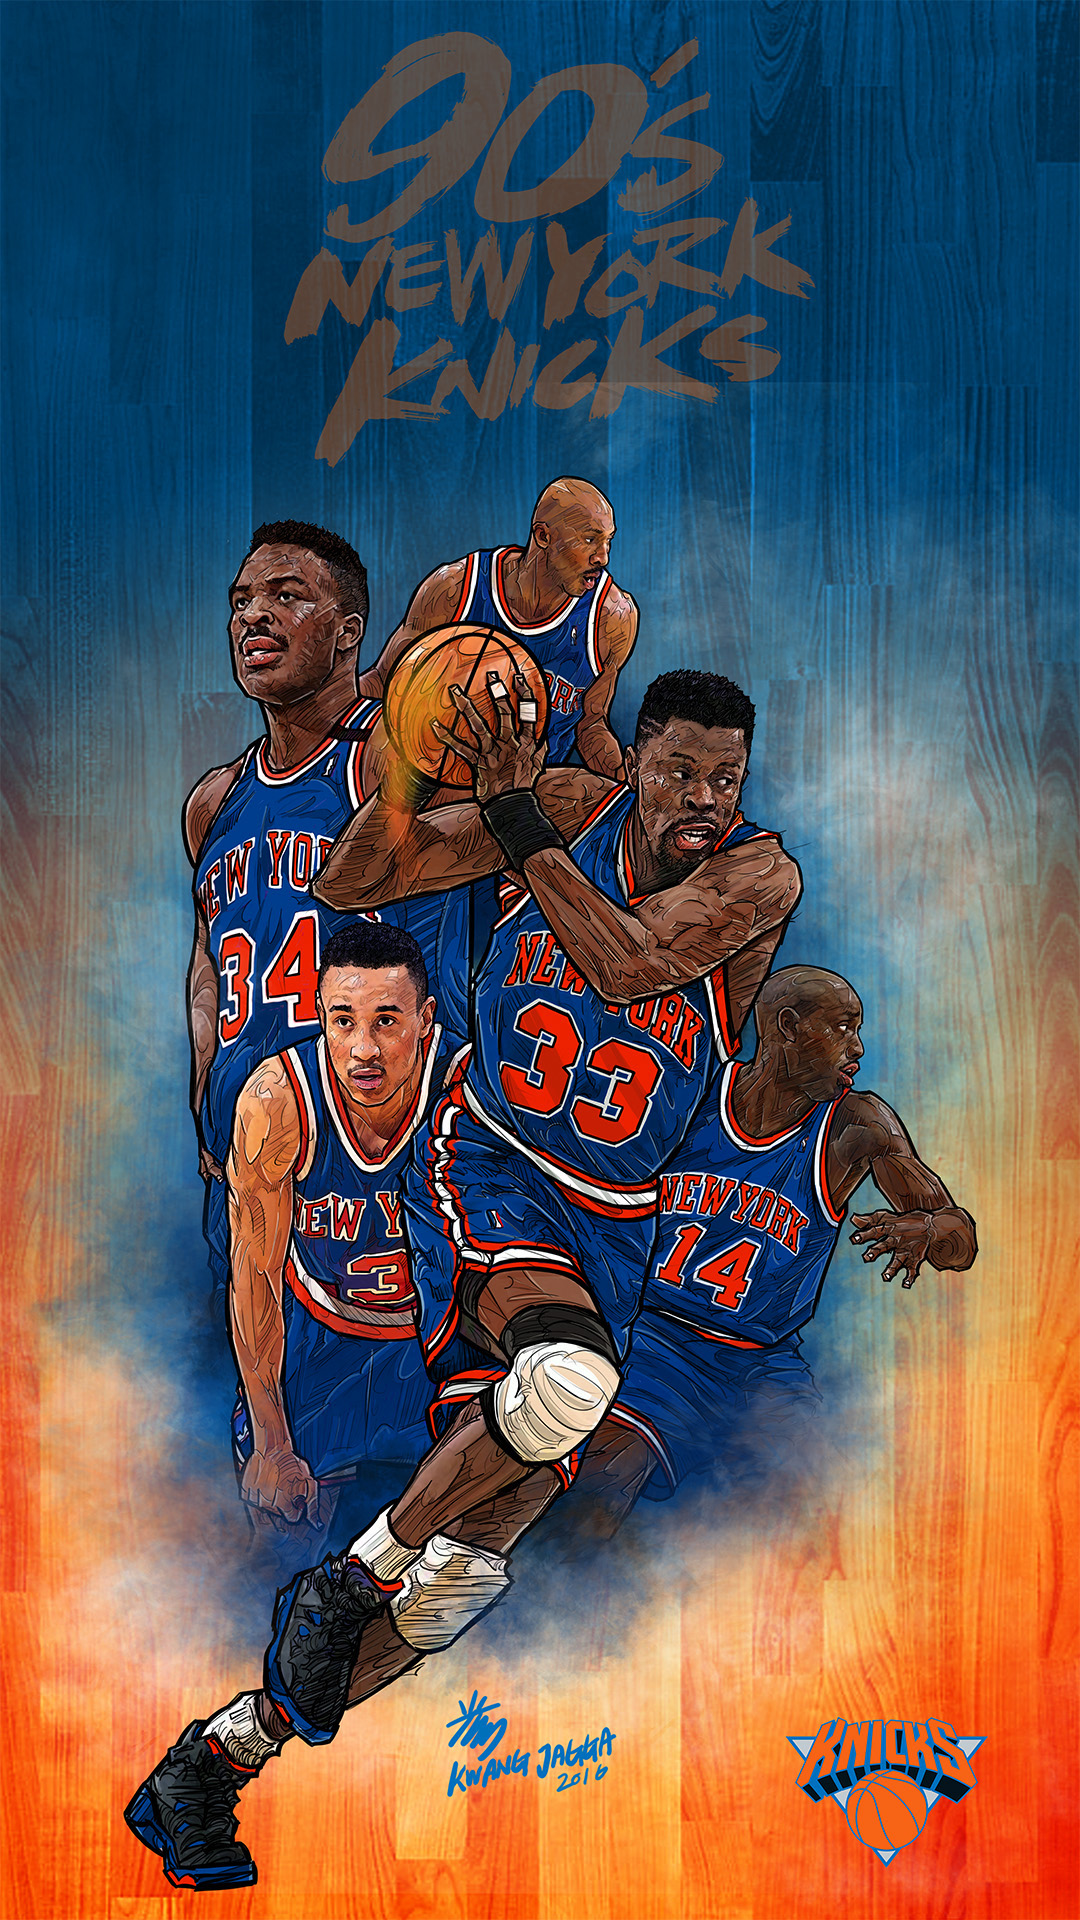 90s New York Knicks Smartphone Lock Screen Wallpaper On Behance